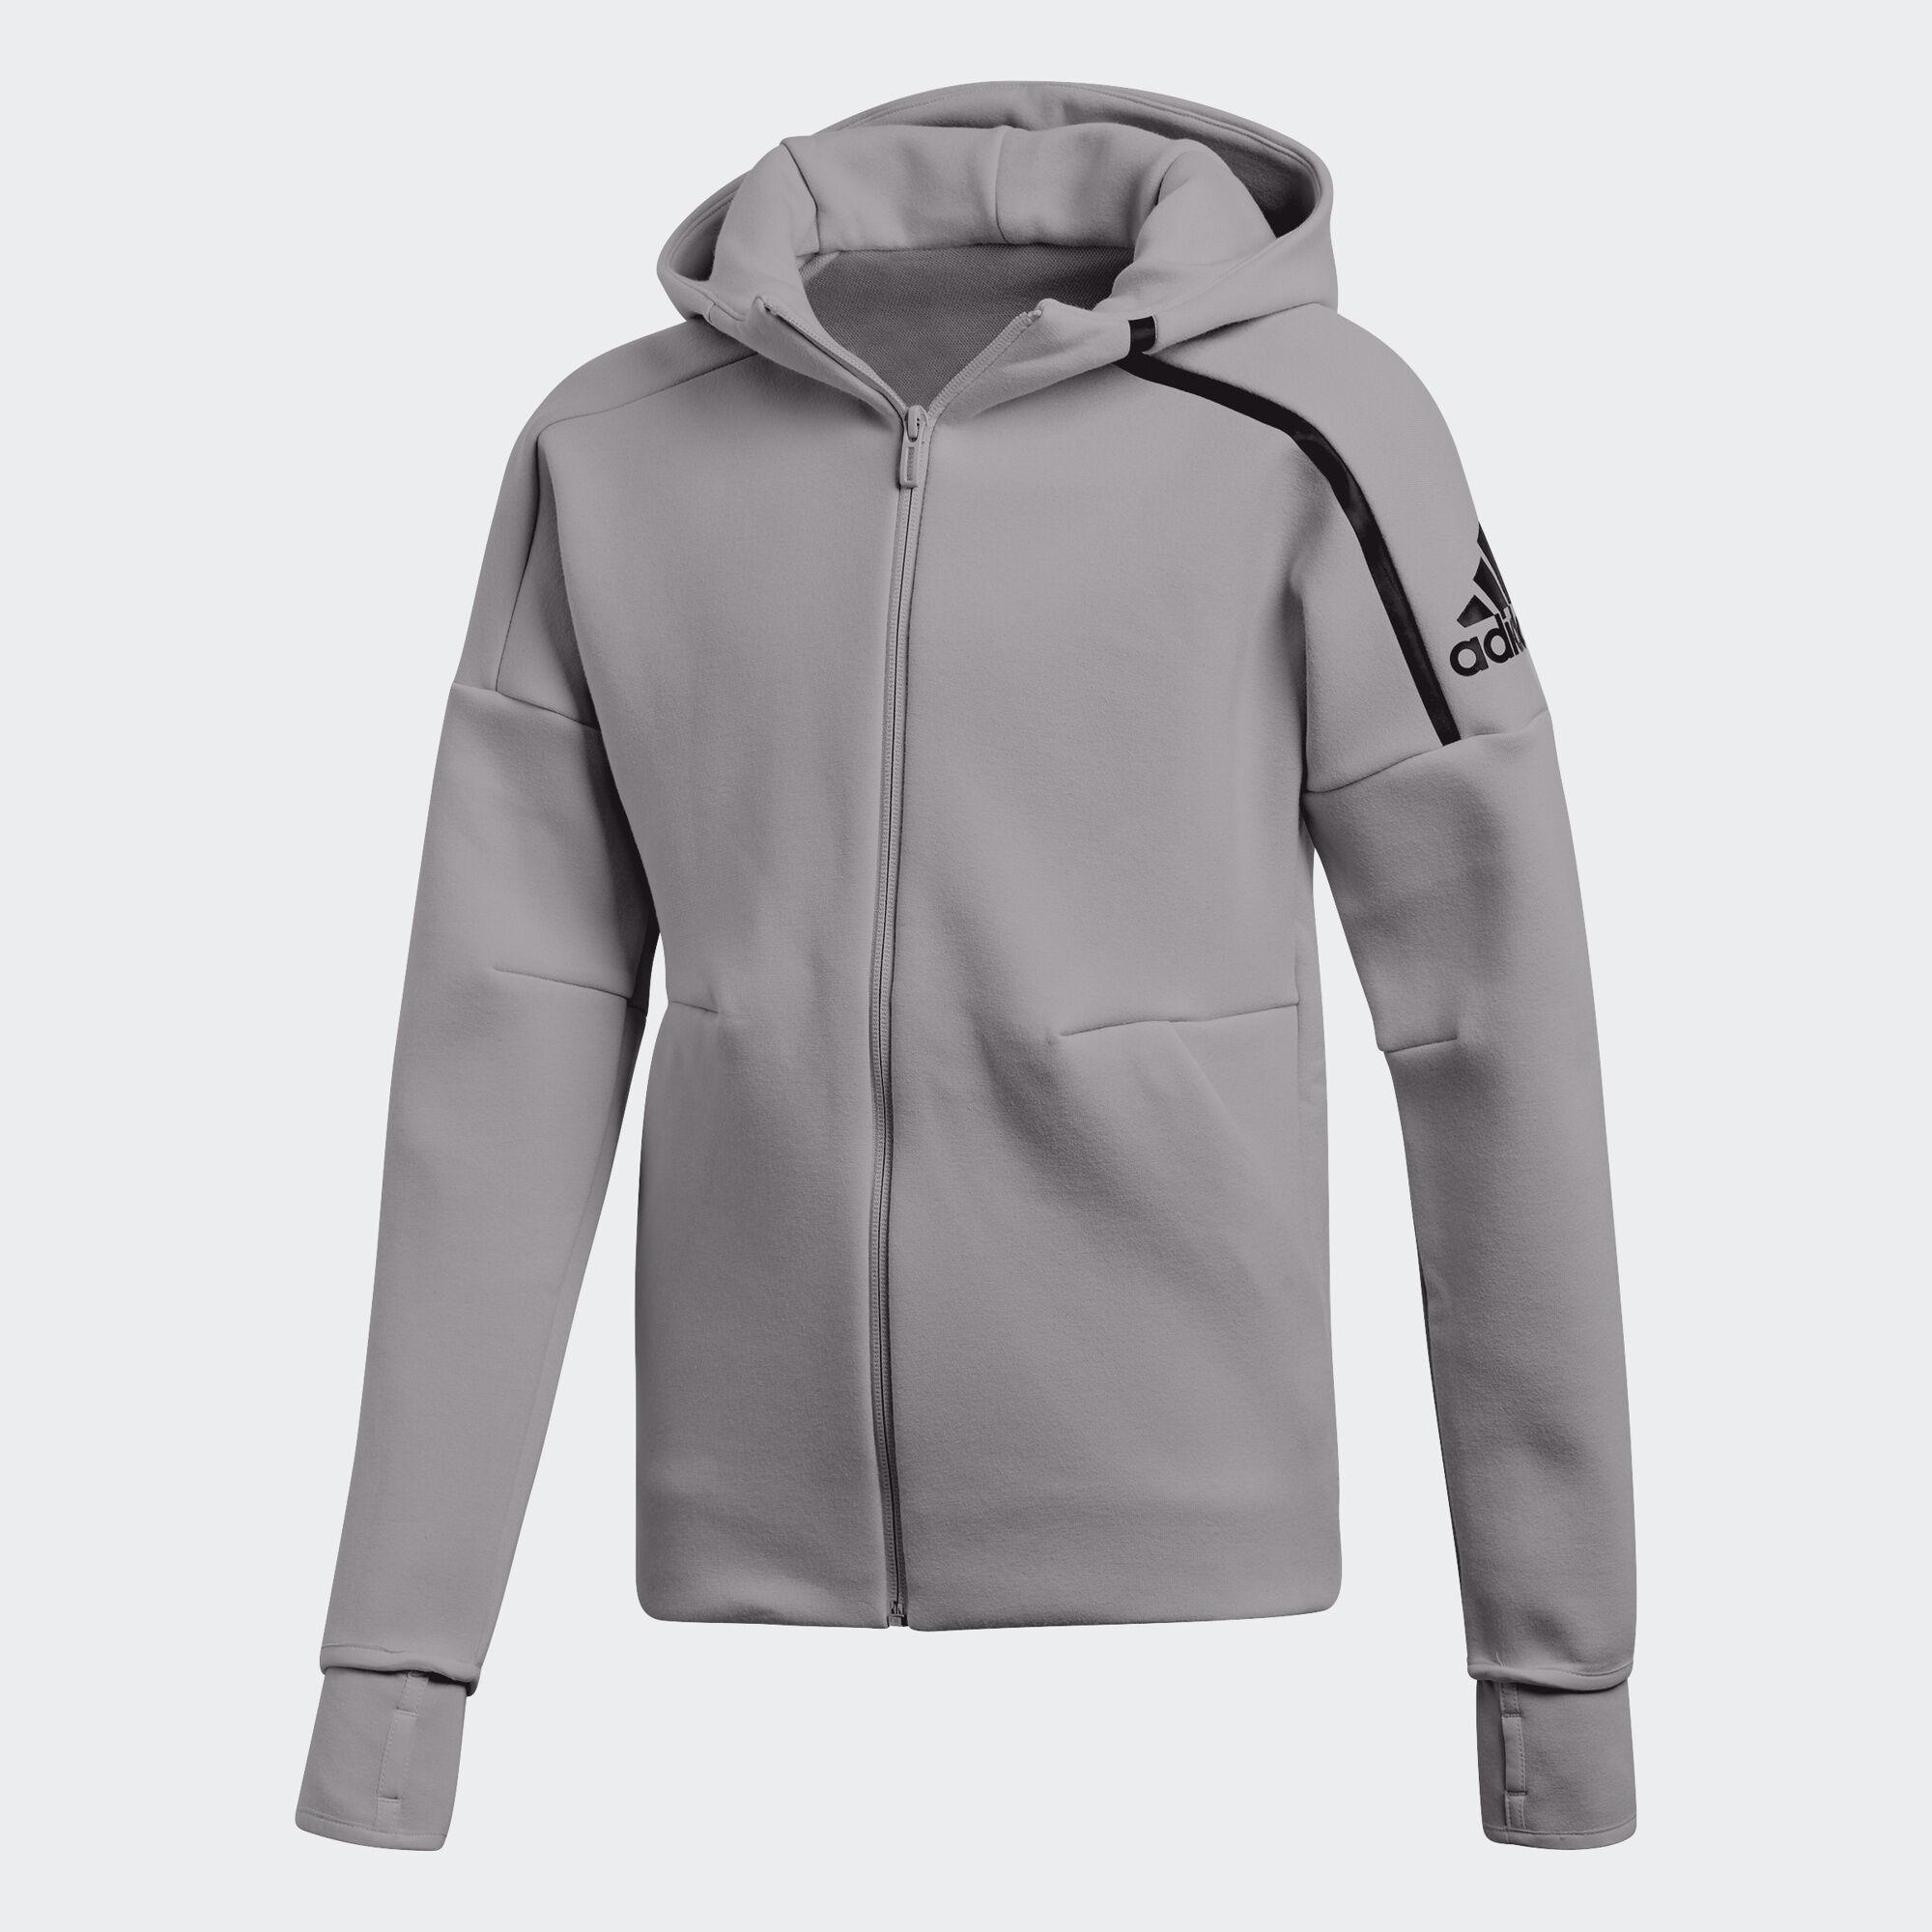 chaqueta con capucha adidas z.n.e. 2